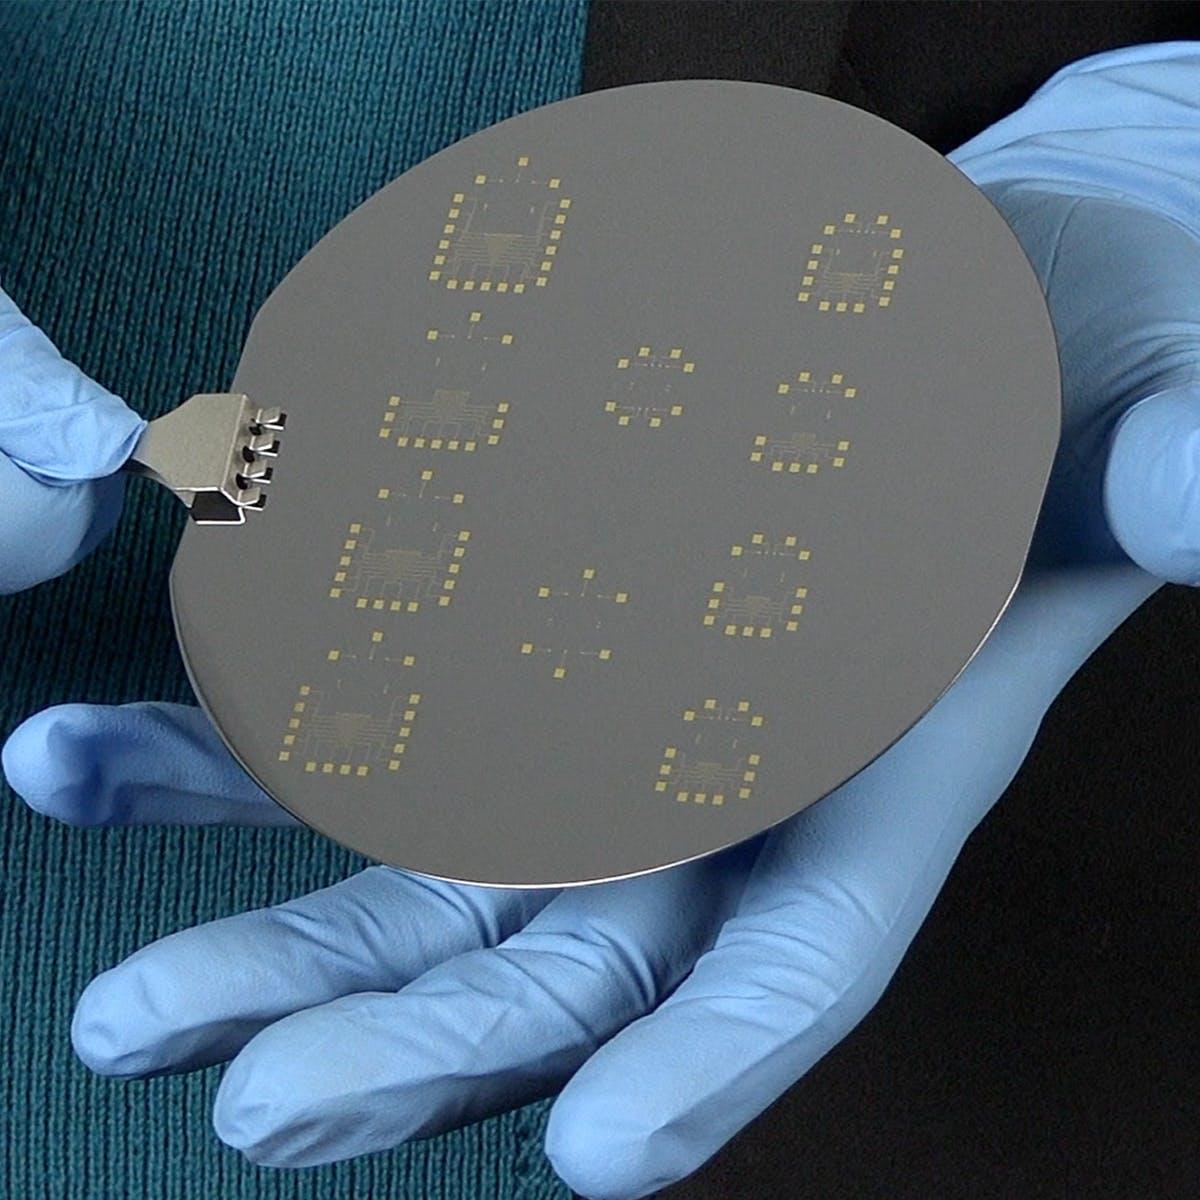 Nanotechnology: A Maker's Course